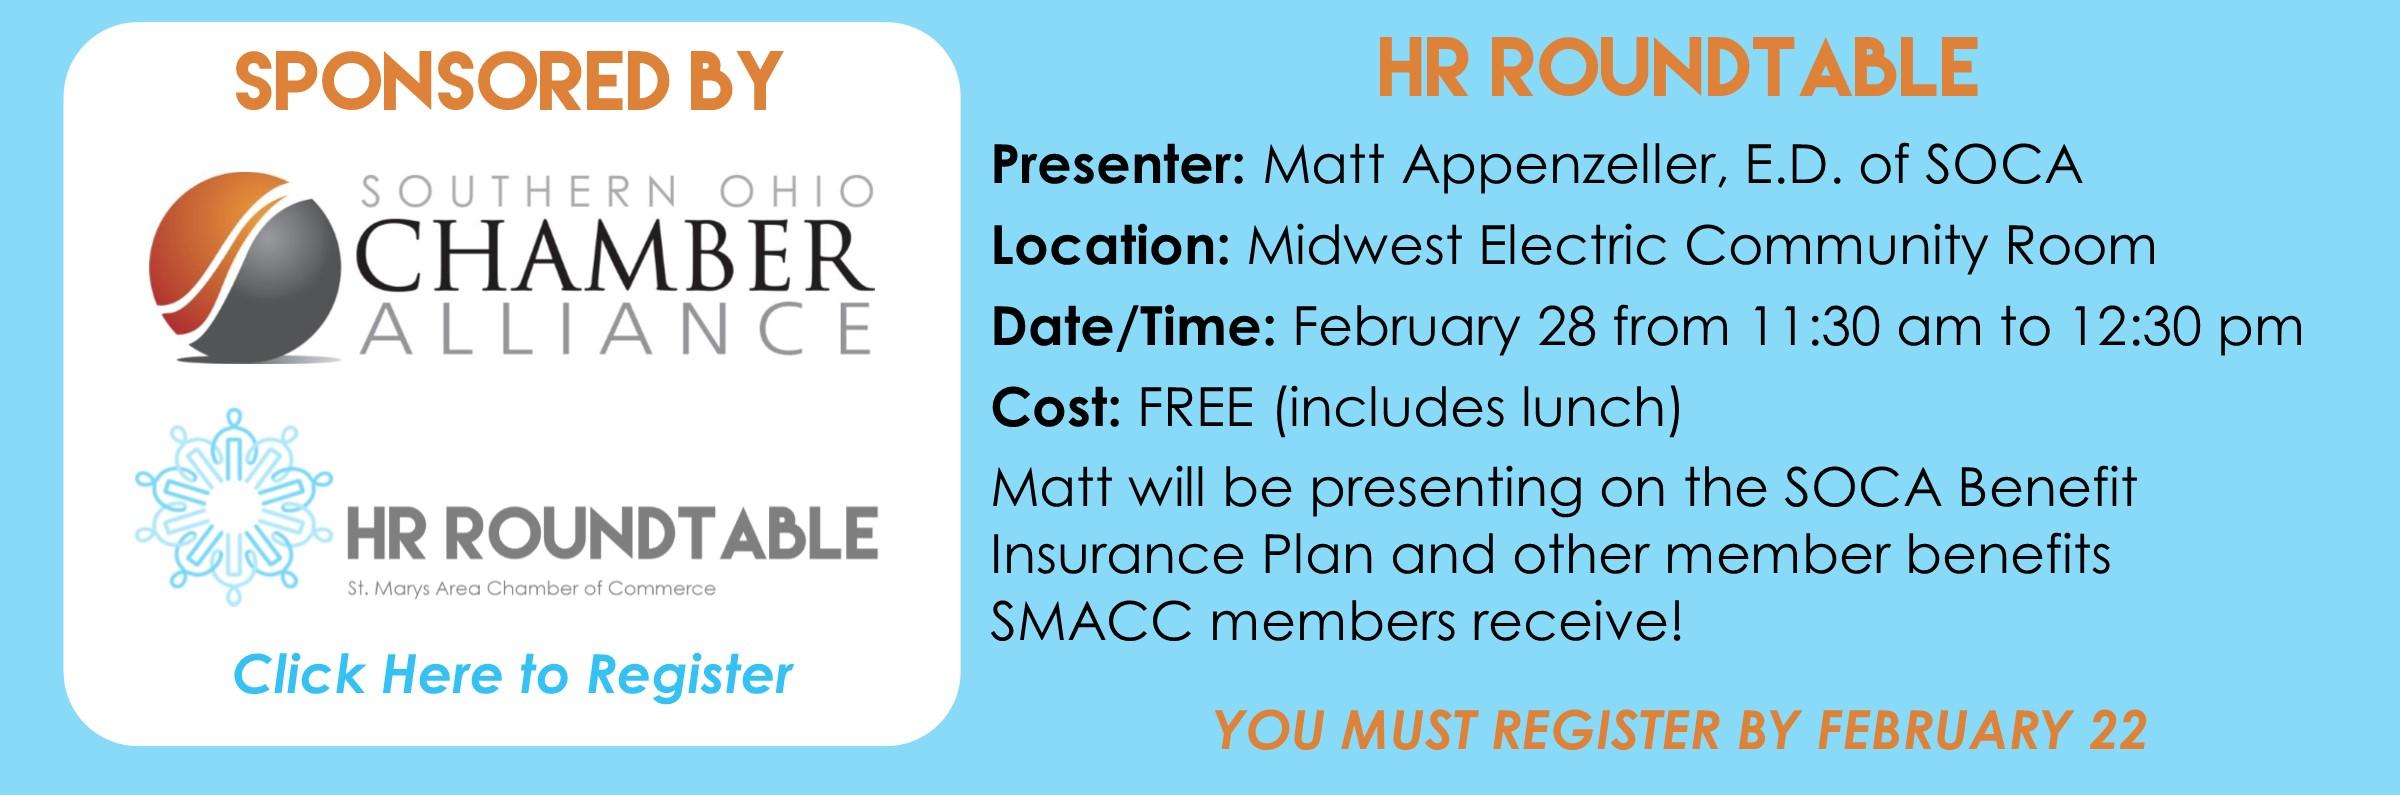 HR-Roundtable-SOCA.jpg